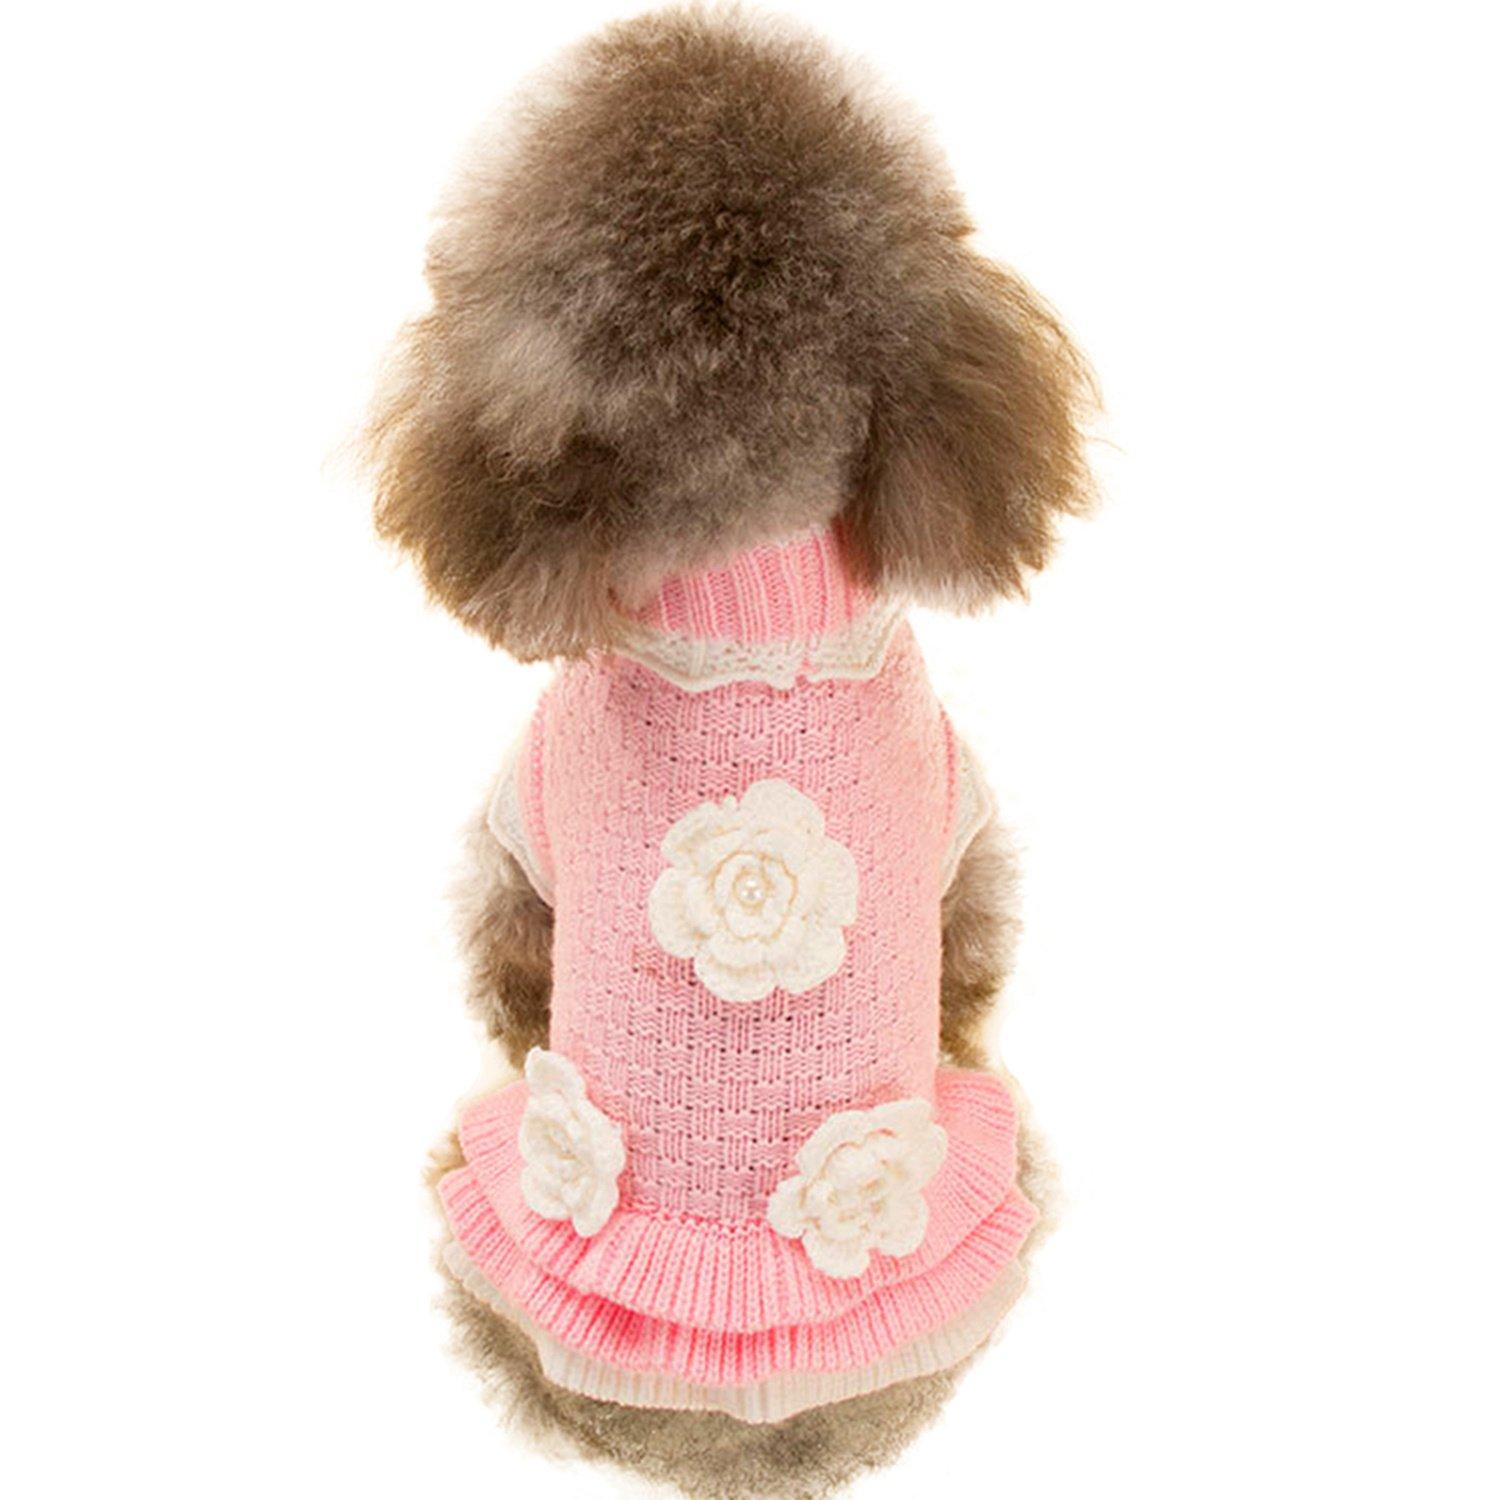 Joytale Turtleneck Flower Studded Pet Dog Sweater Apparel, Pink Female Girl Dog Winter Clothes, Fits Small Puppy Medium Breeds; Back Length 15.7''